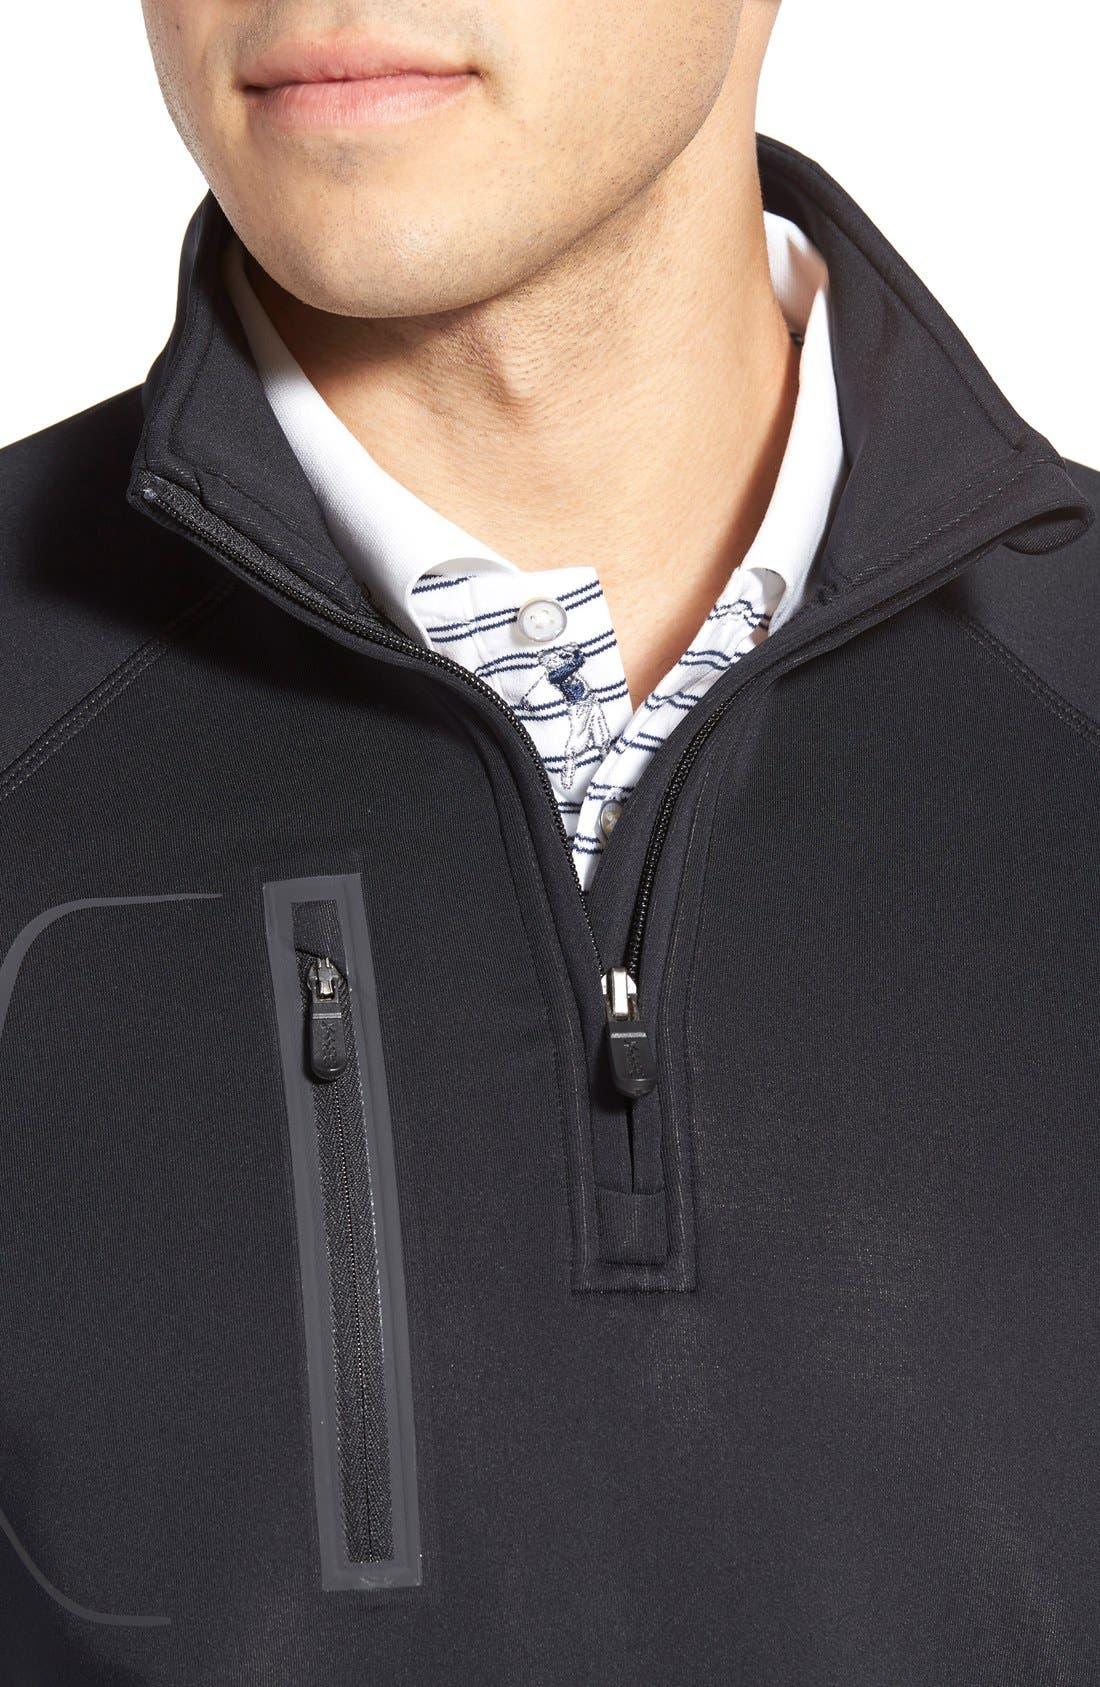 XH2O Crawford Stretch Quarter Zip Golf Vest,                             Alternate thumbnail 4, color,                             001